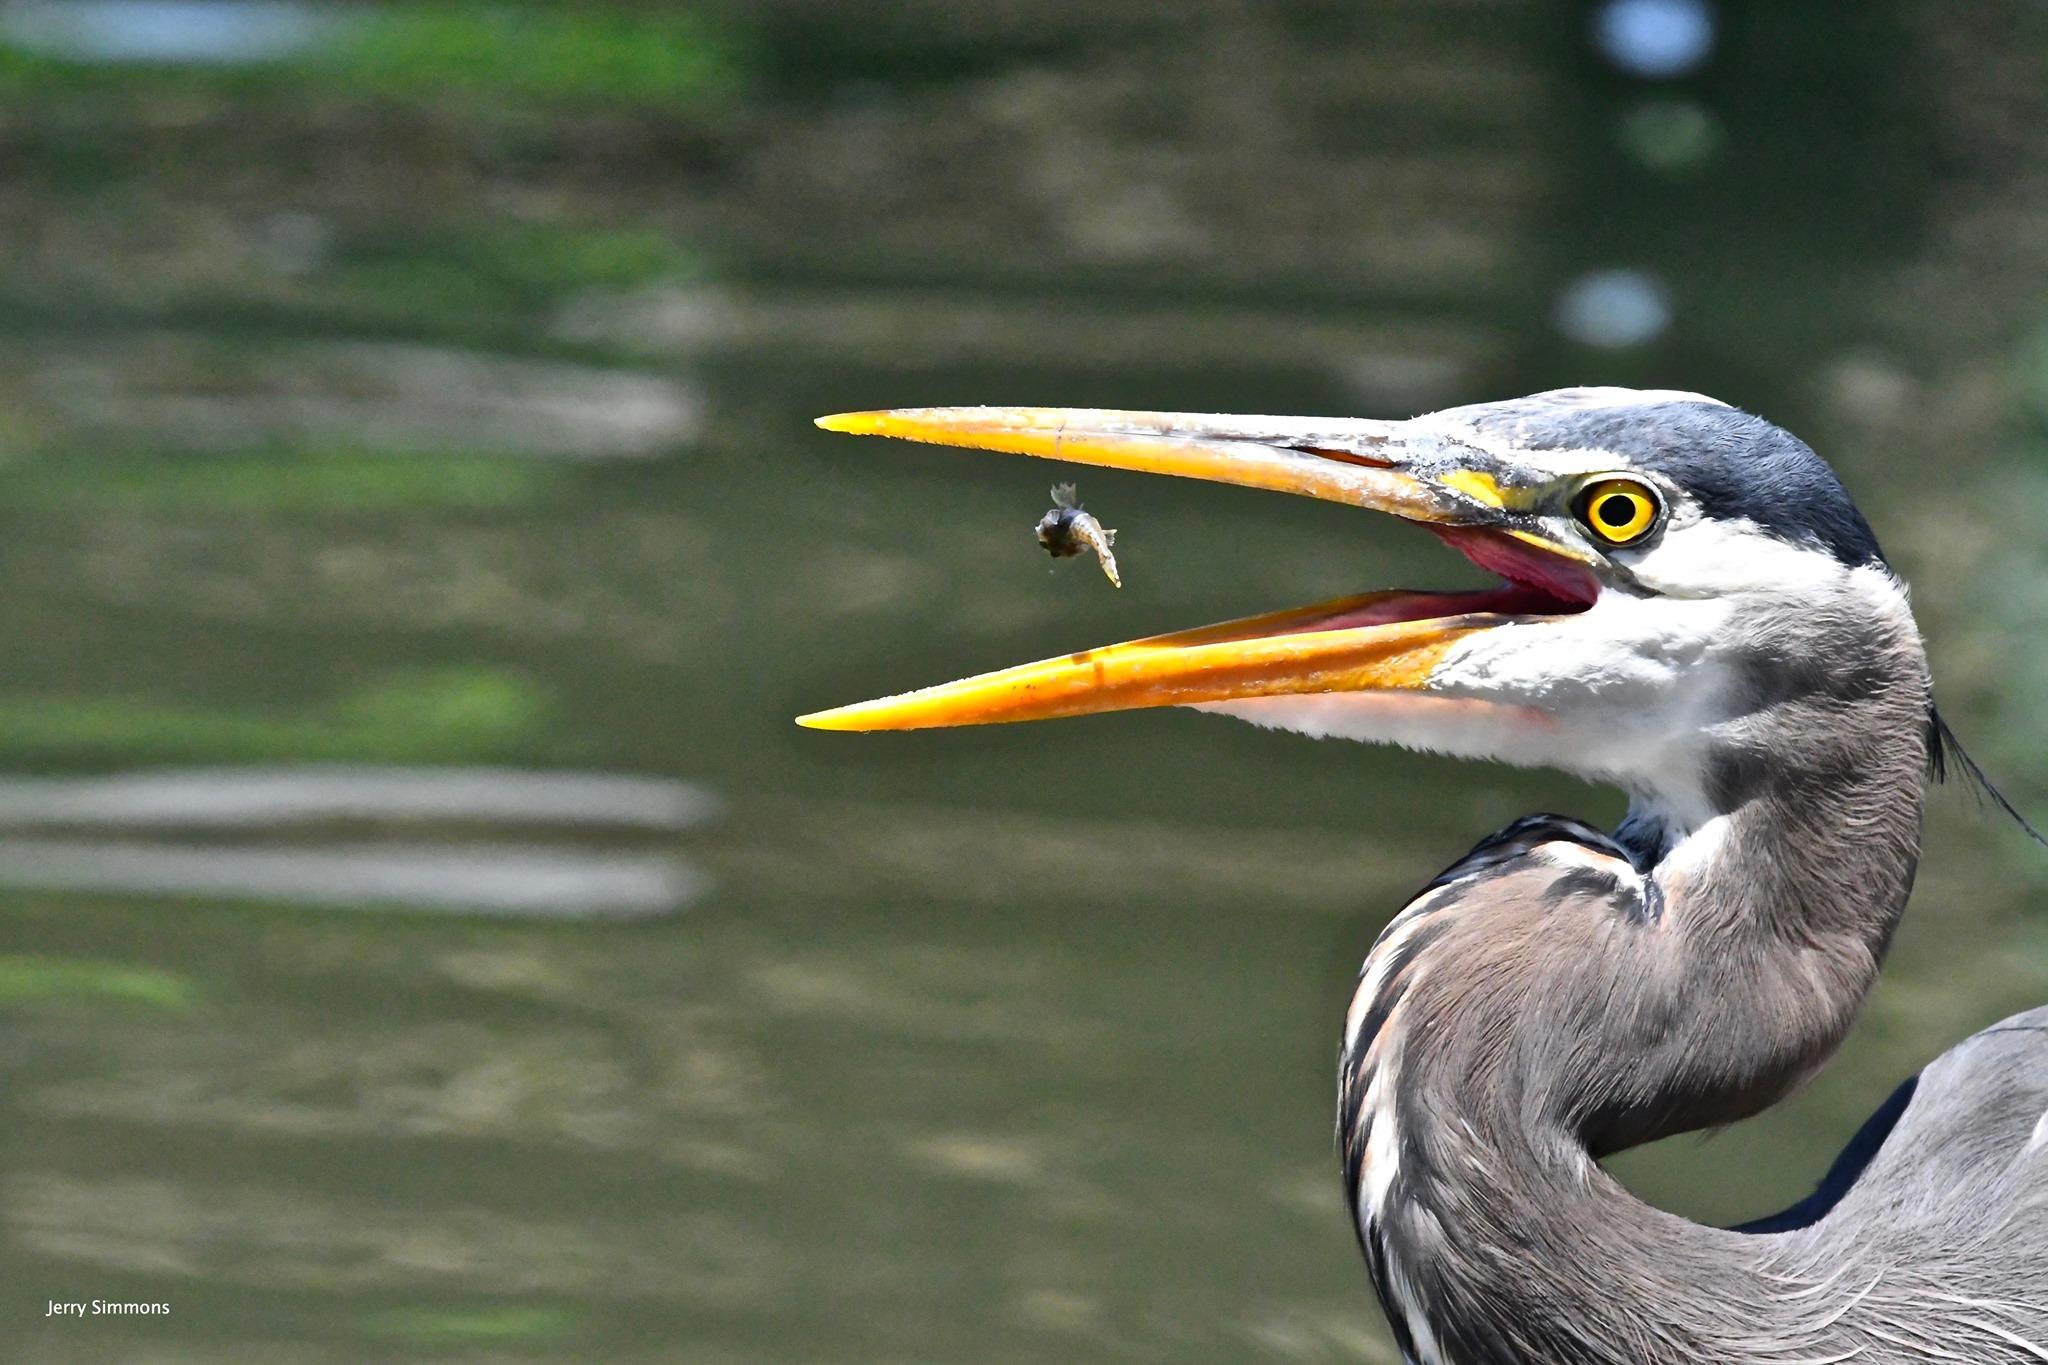 Wildlife in Ballard: Great Blue Herons at the Locks – My Ballard